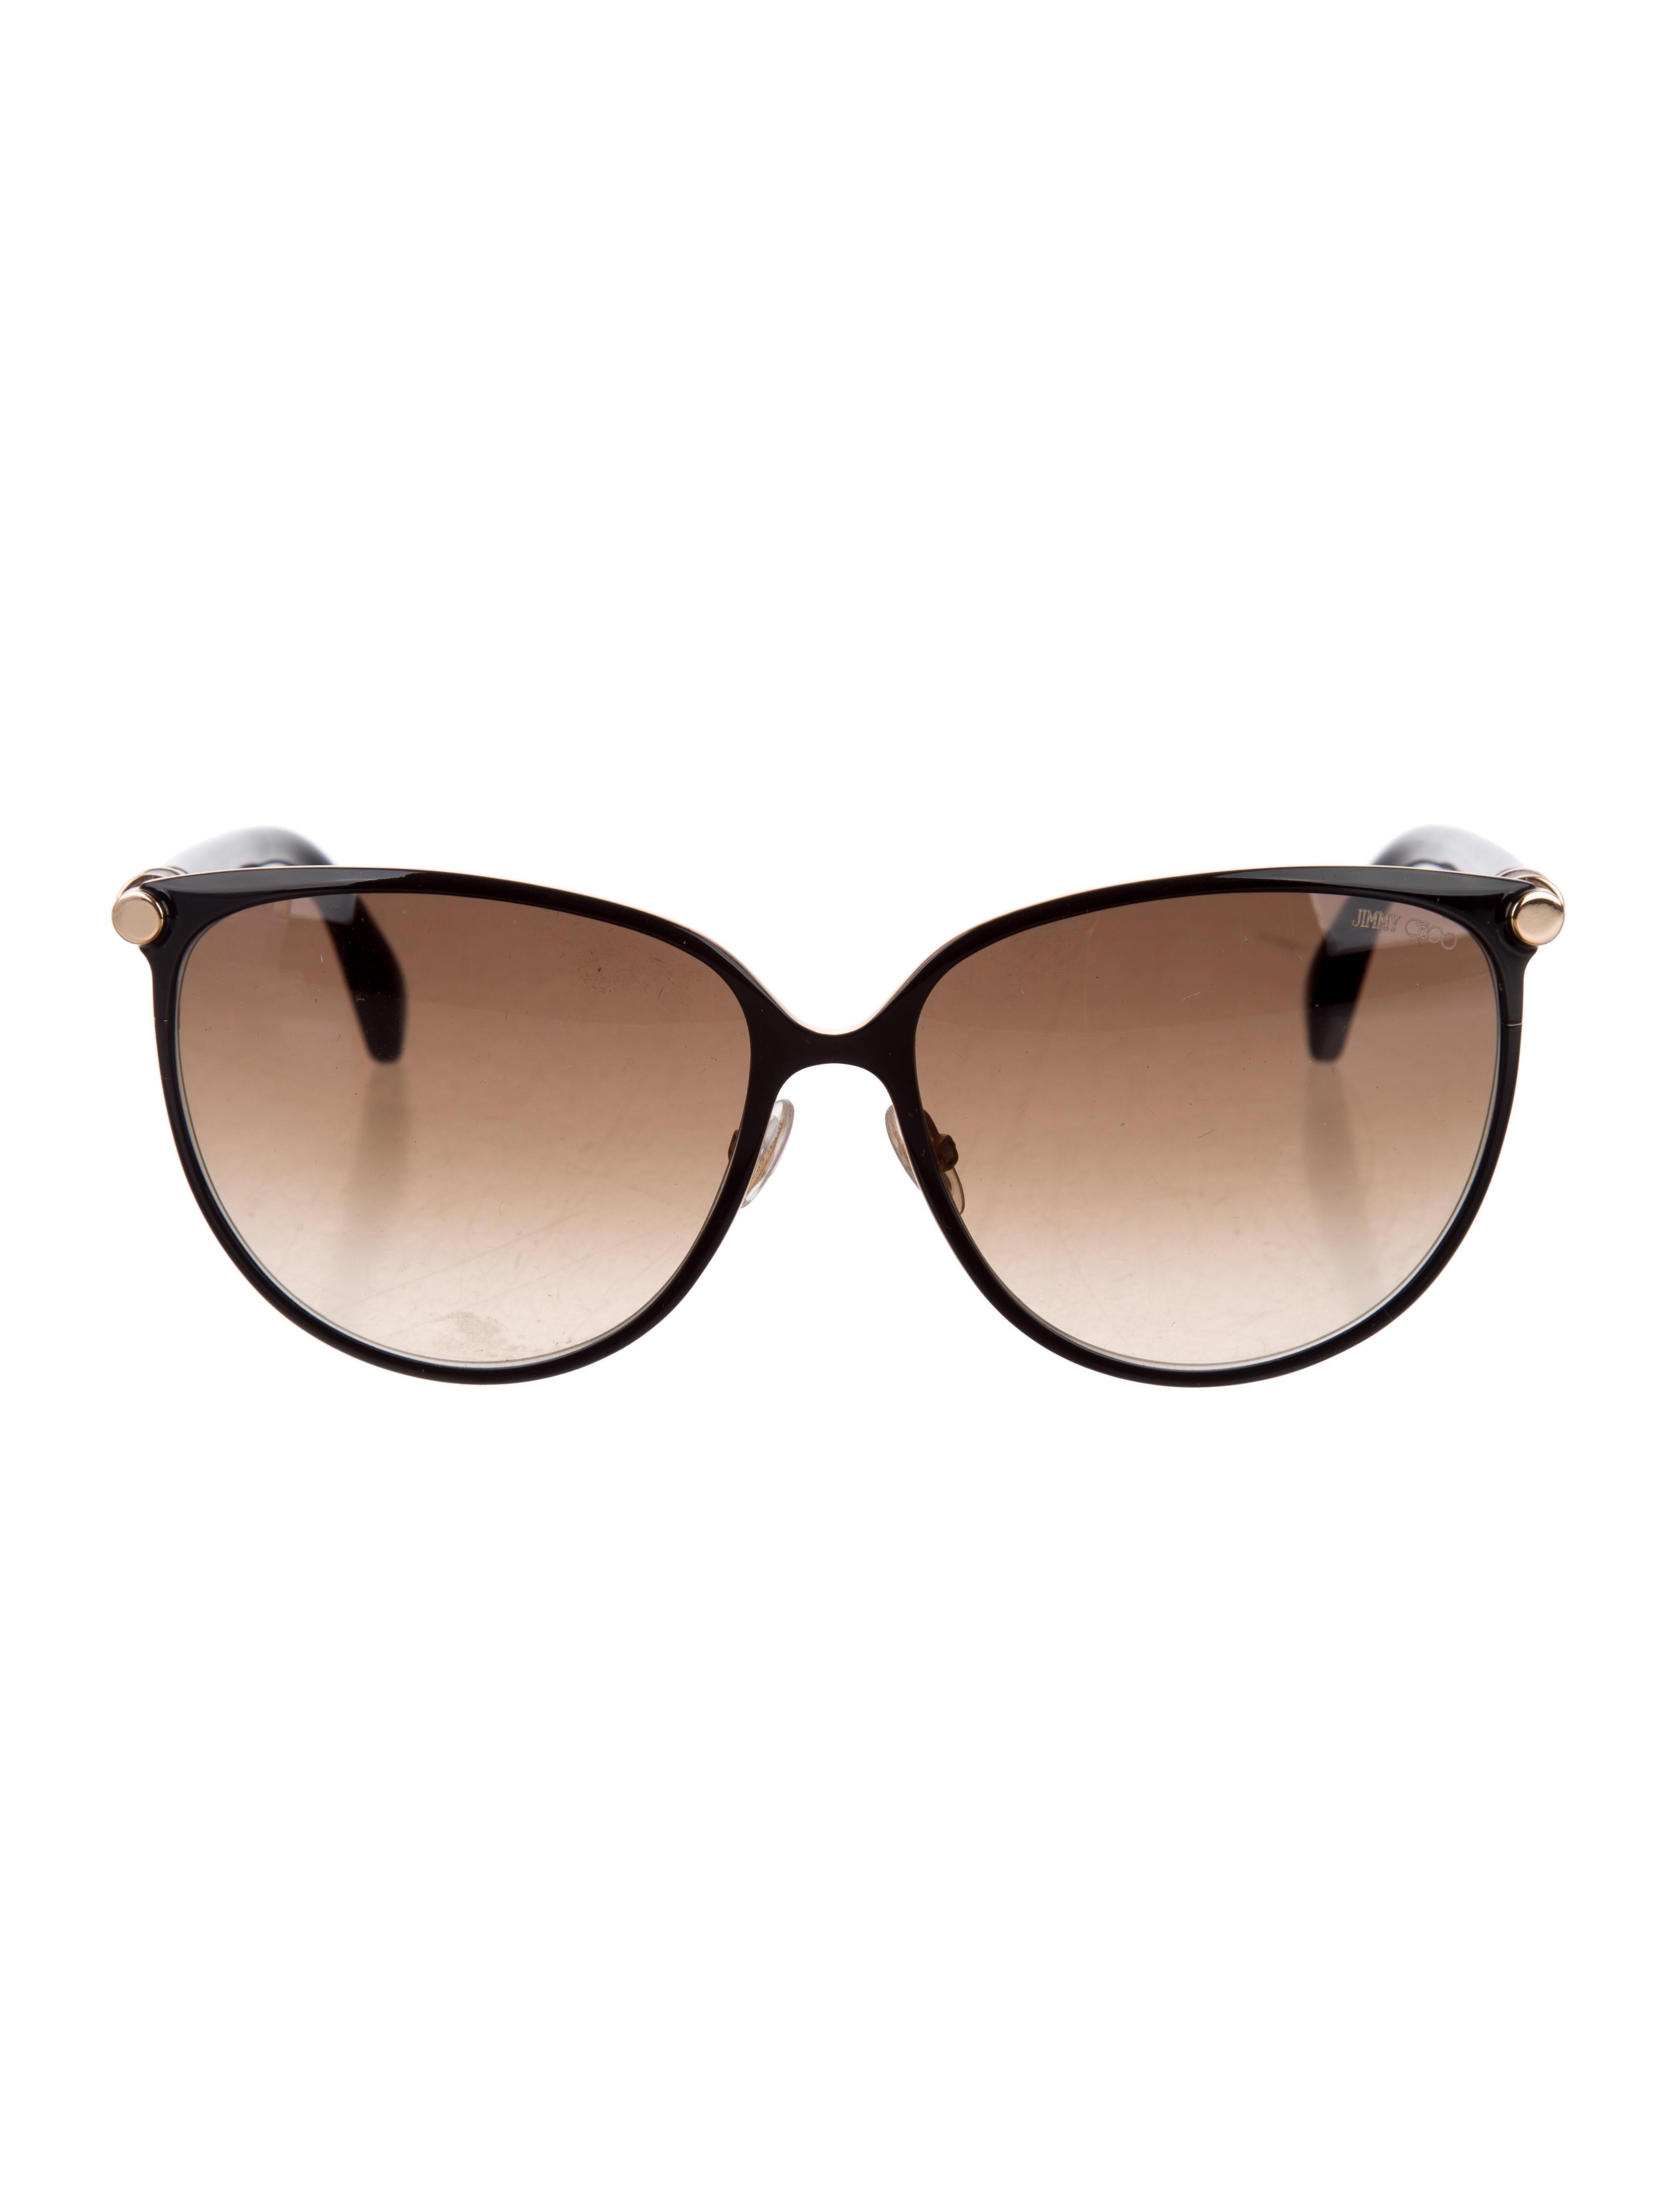 d8b22a4bd0 Jimmy Choo Juliet Cat-Eye Sunglasses - Accessories - JIM65040